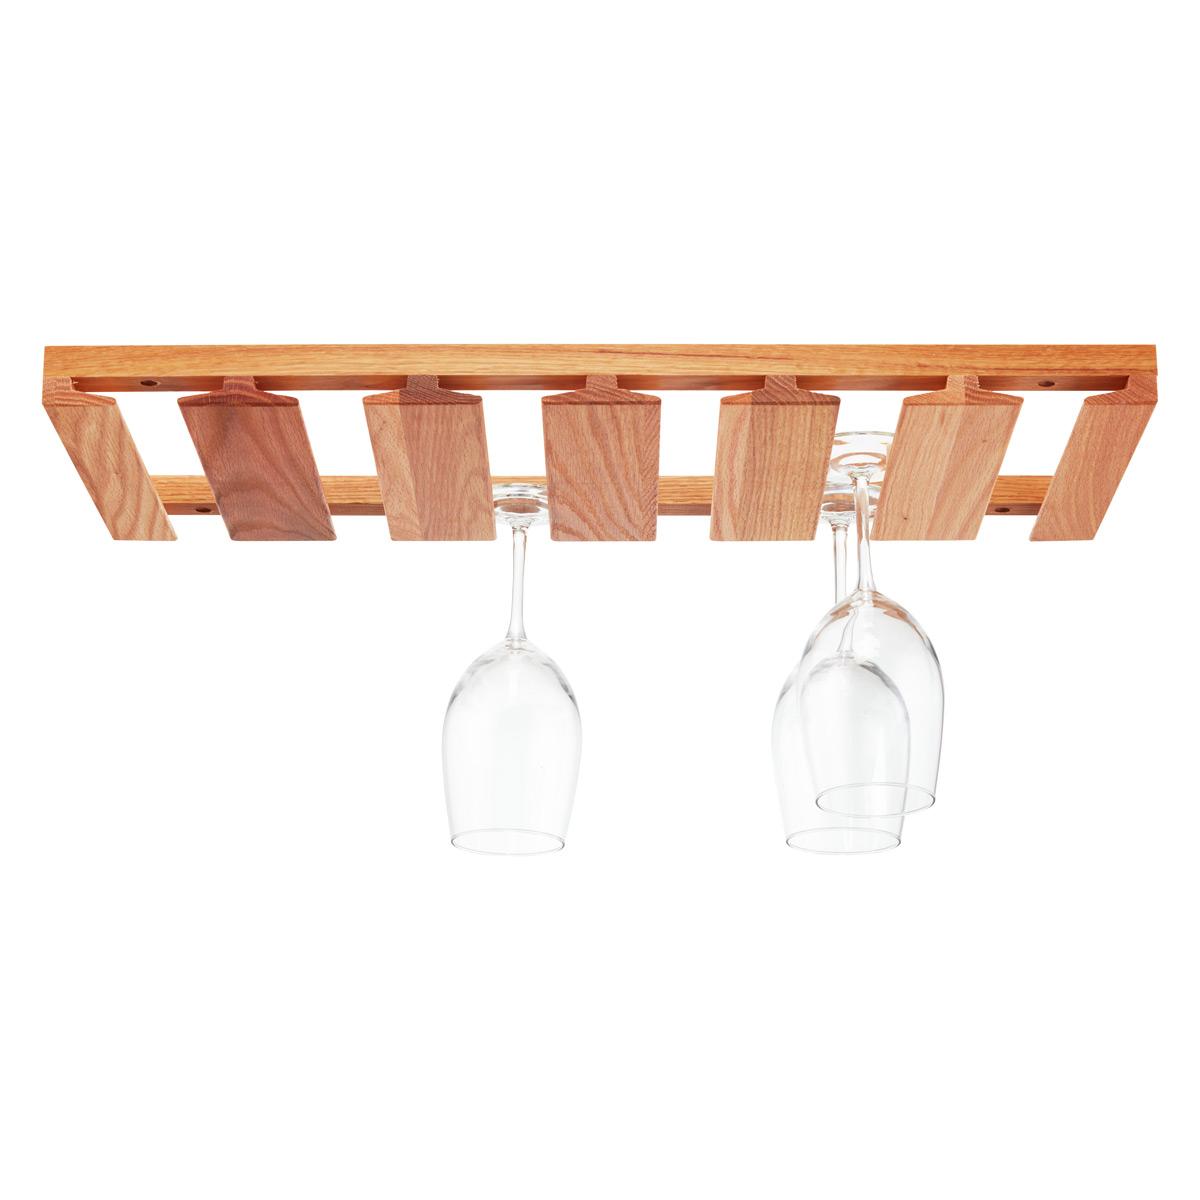 Attirant J.K. Adams Oak Undercabinet Wine Glass Rack